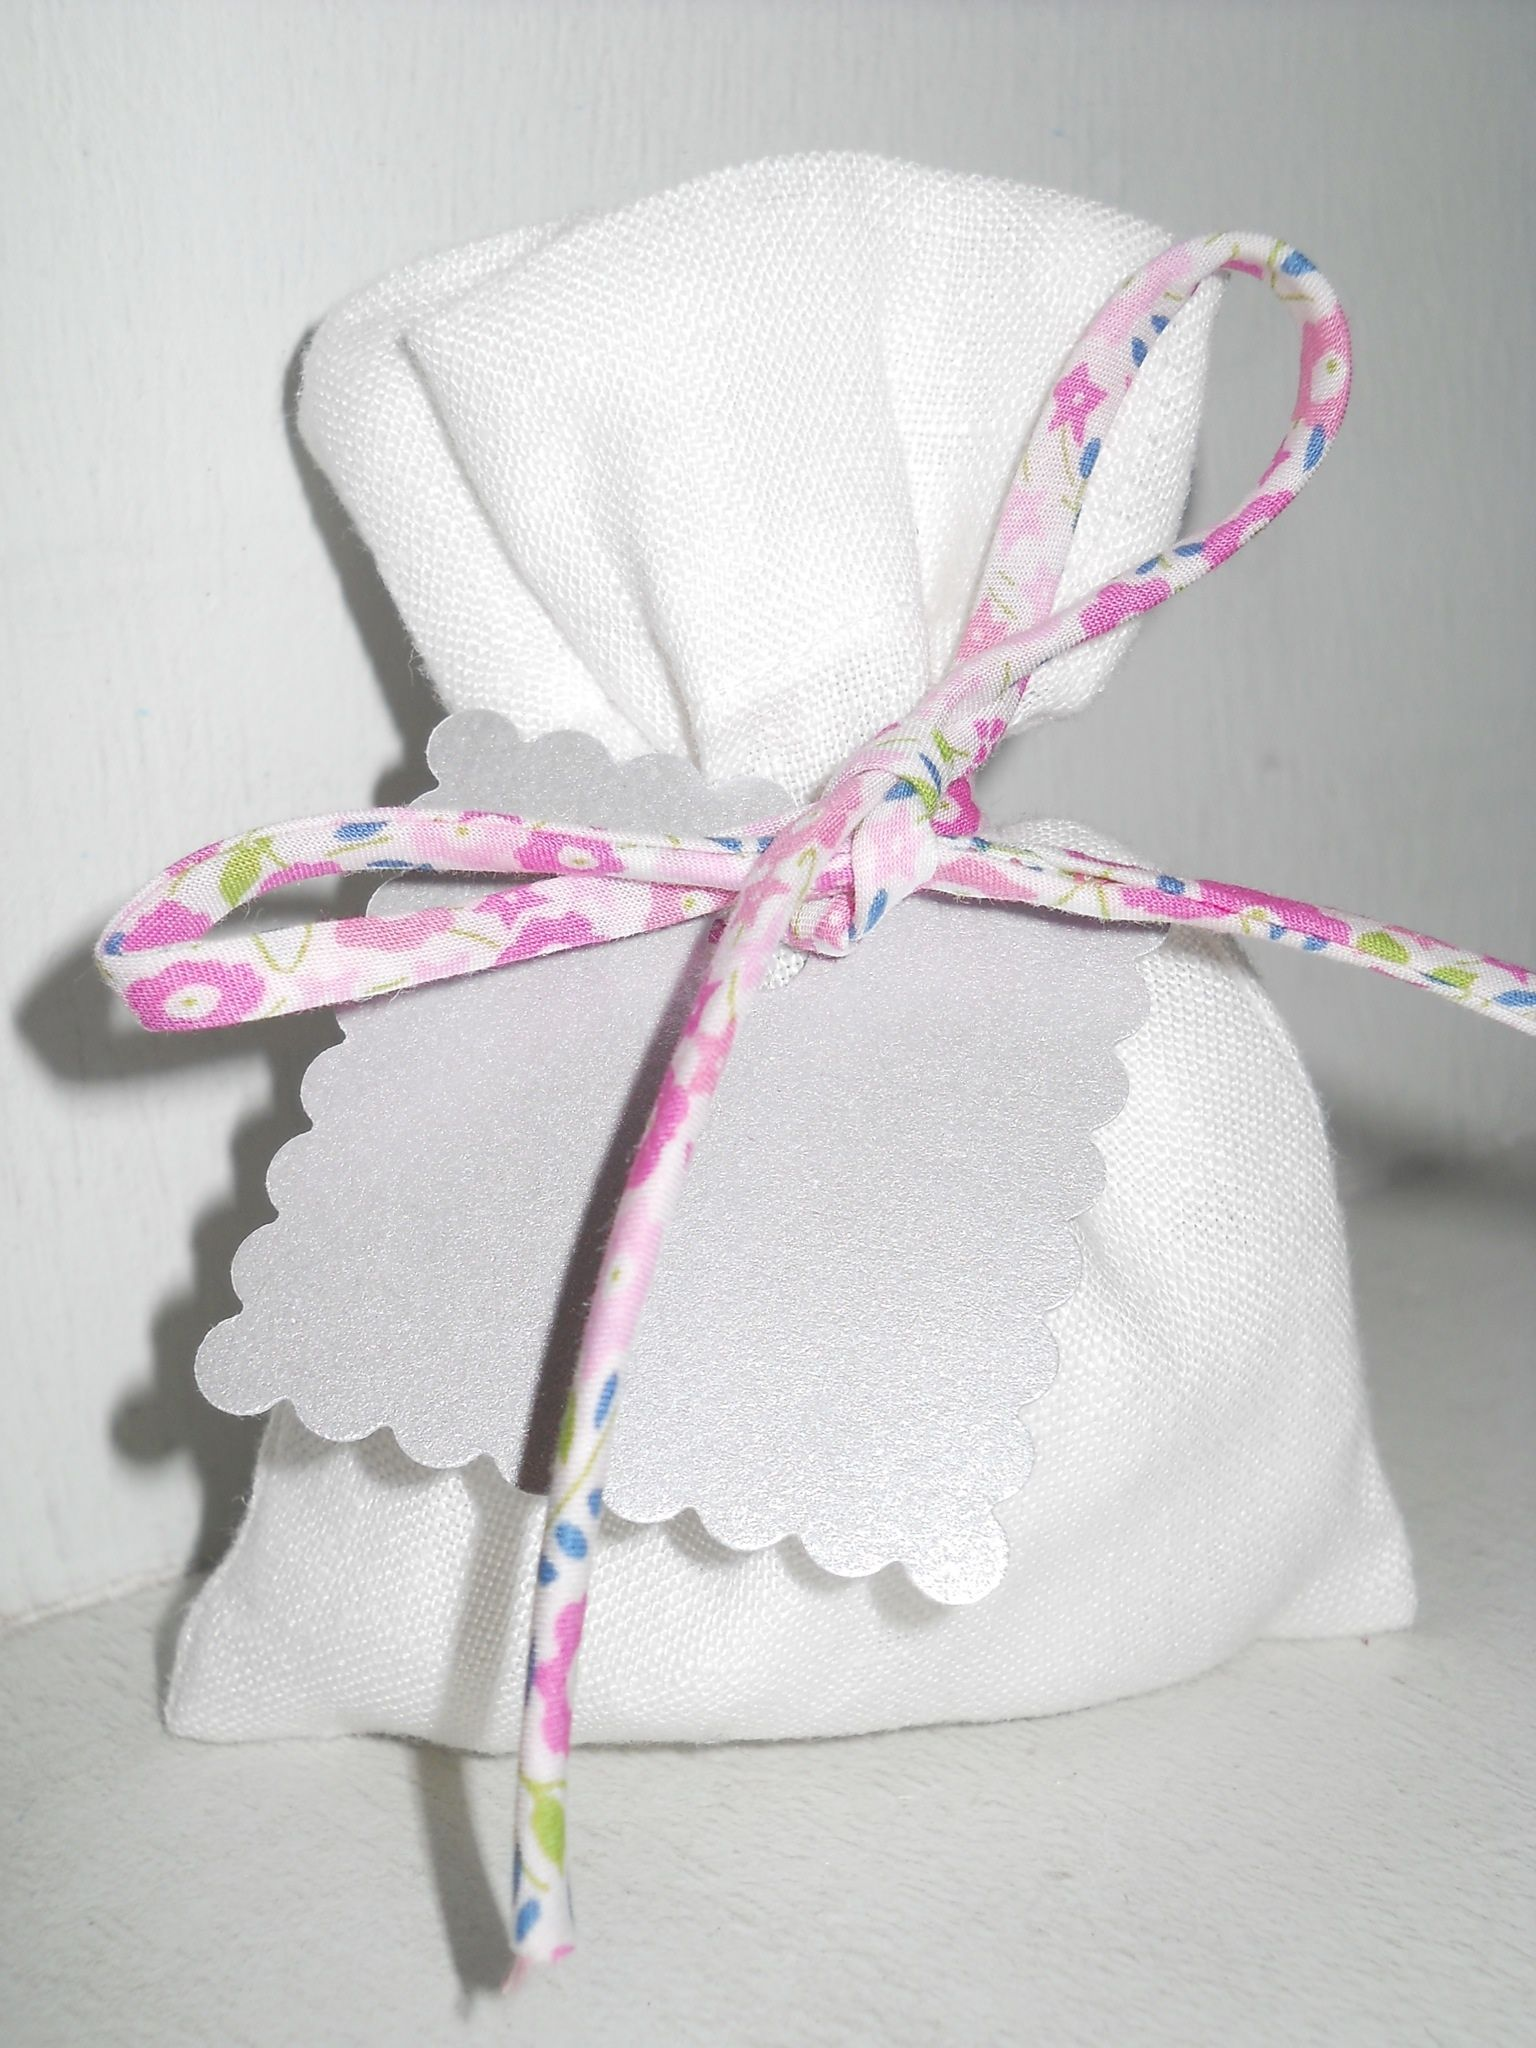 Pochon dragées lin blanc et cordon Liberty fairford rose